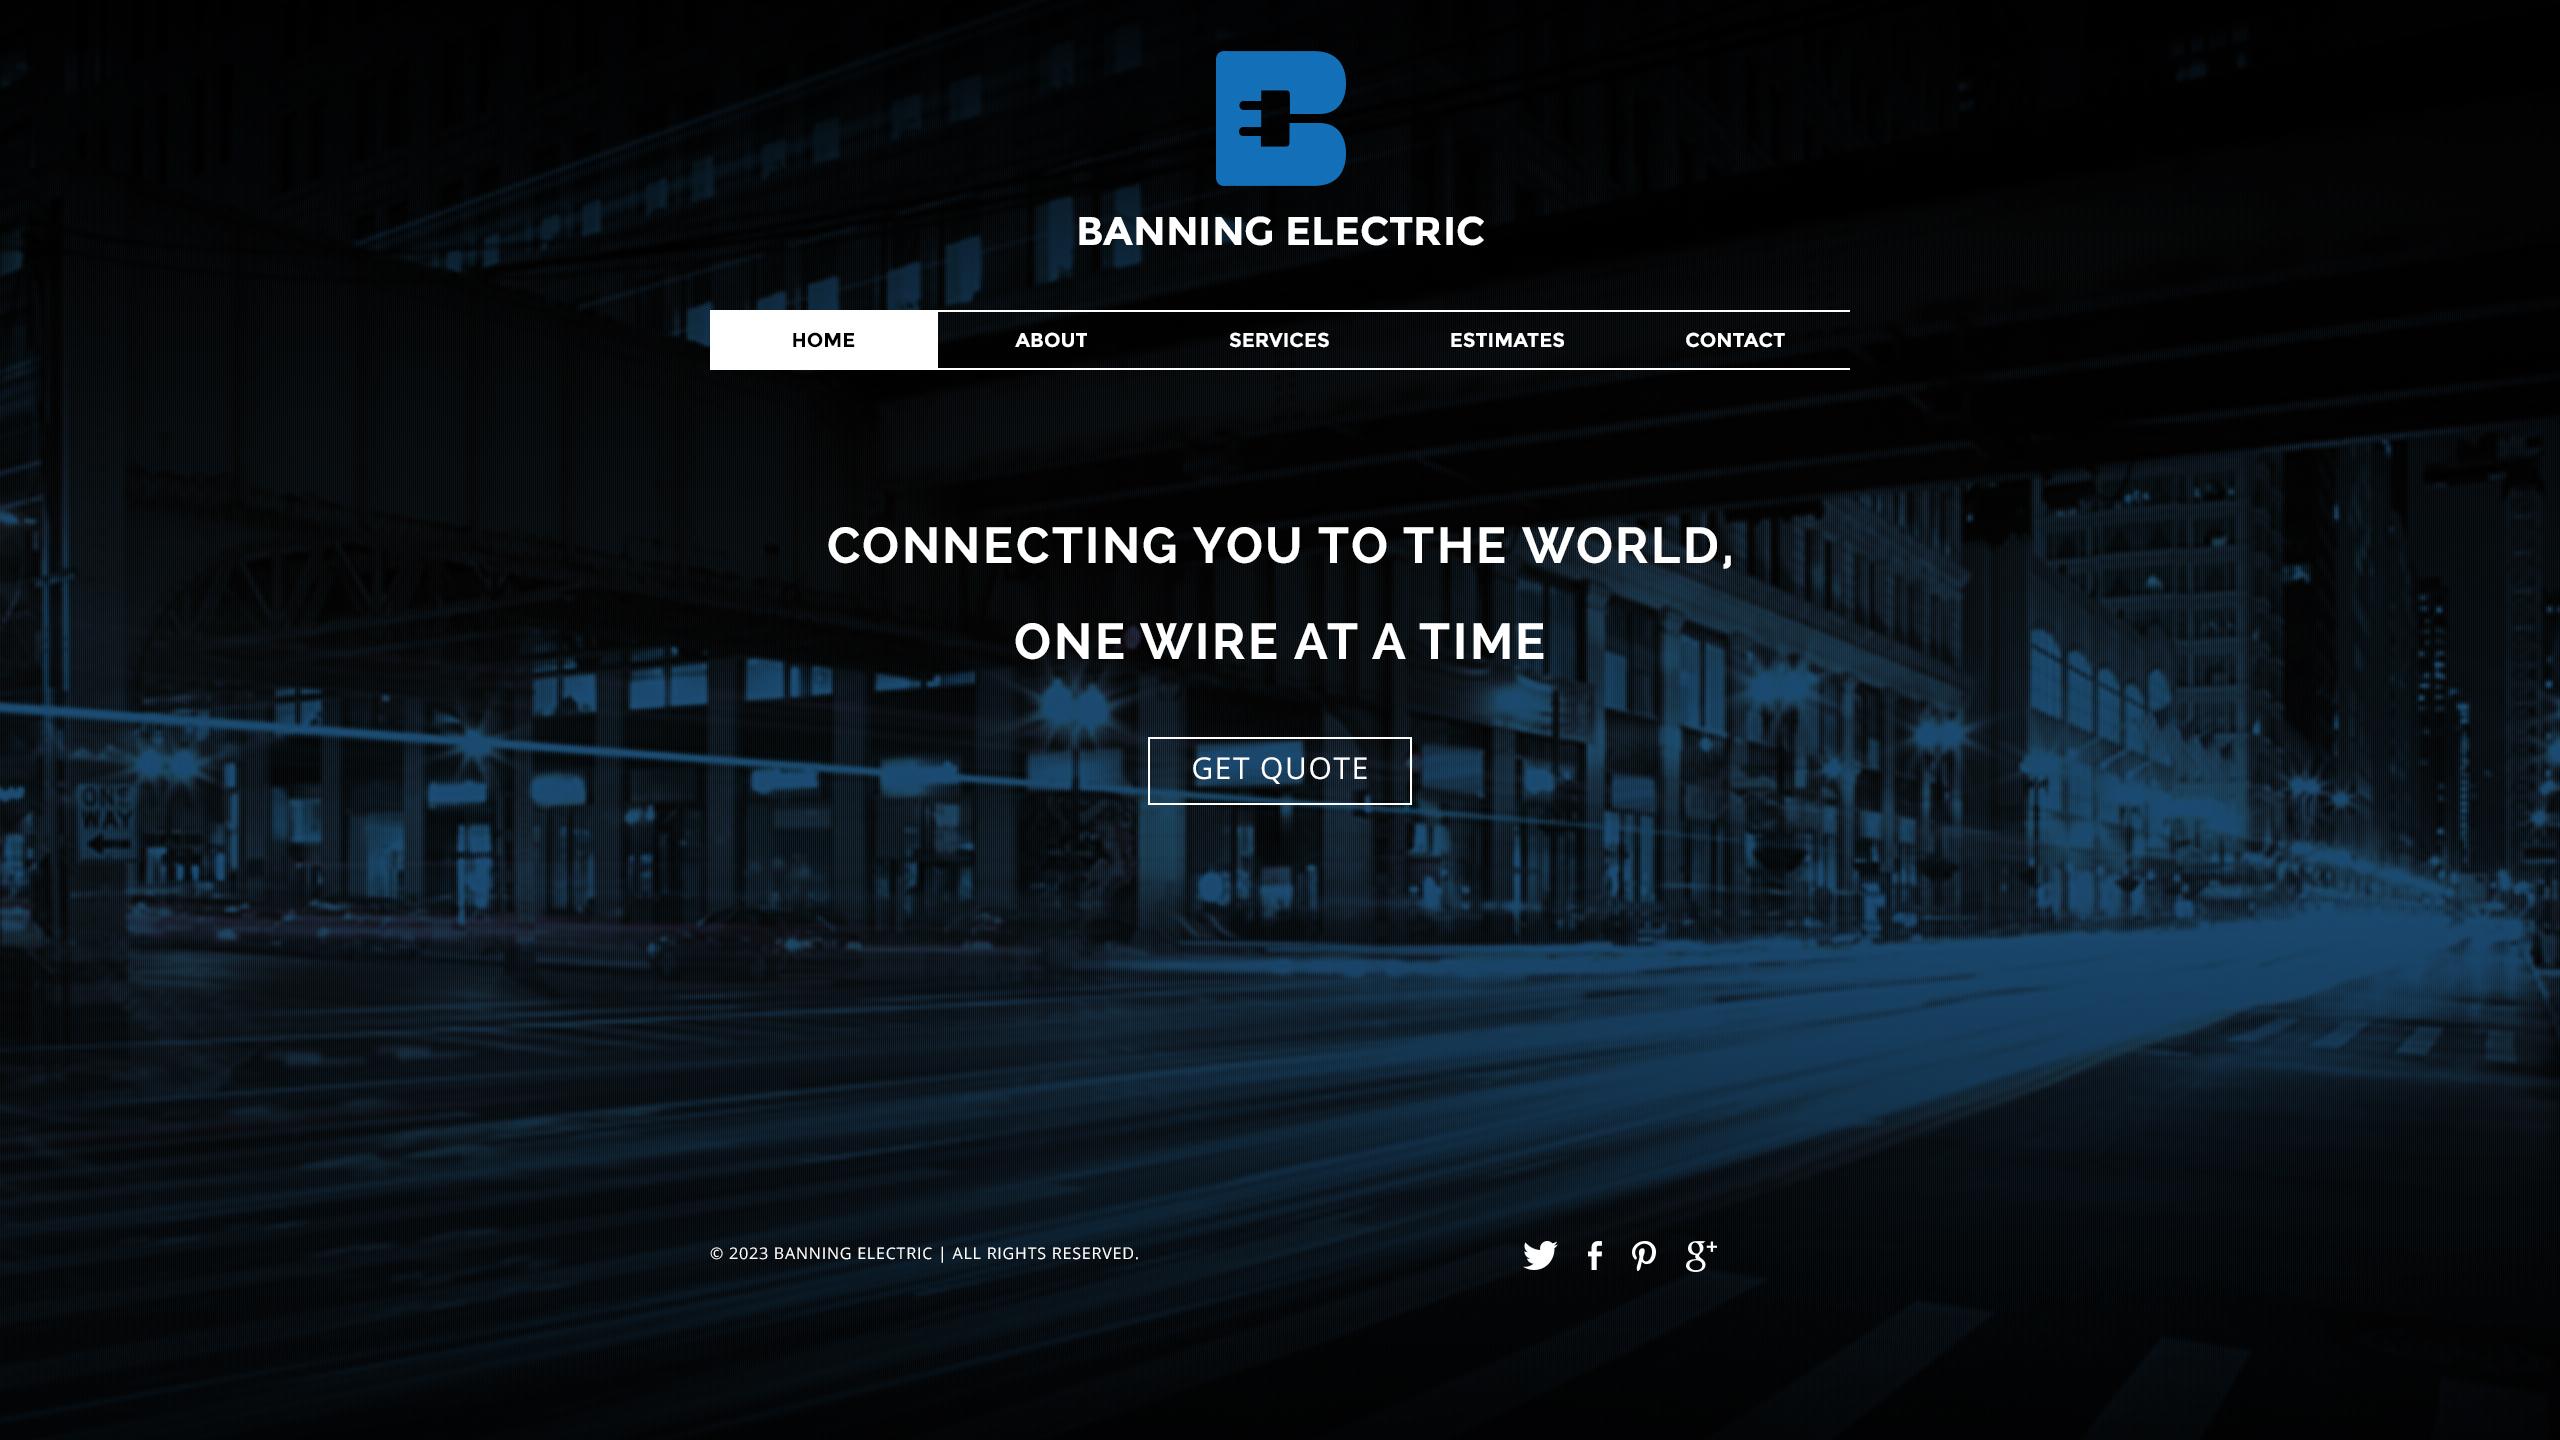 006 Banning Electric 1.jpg